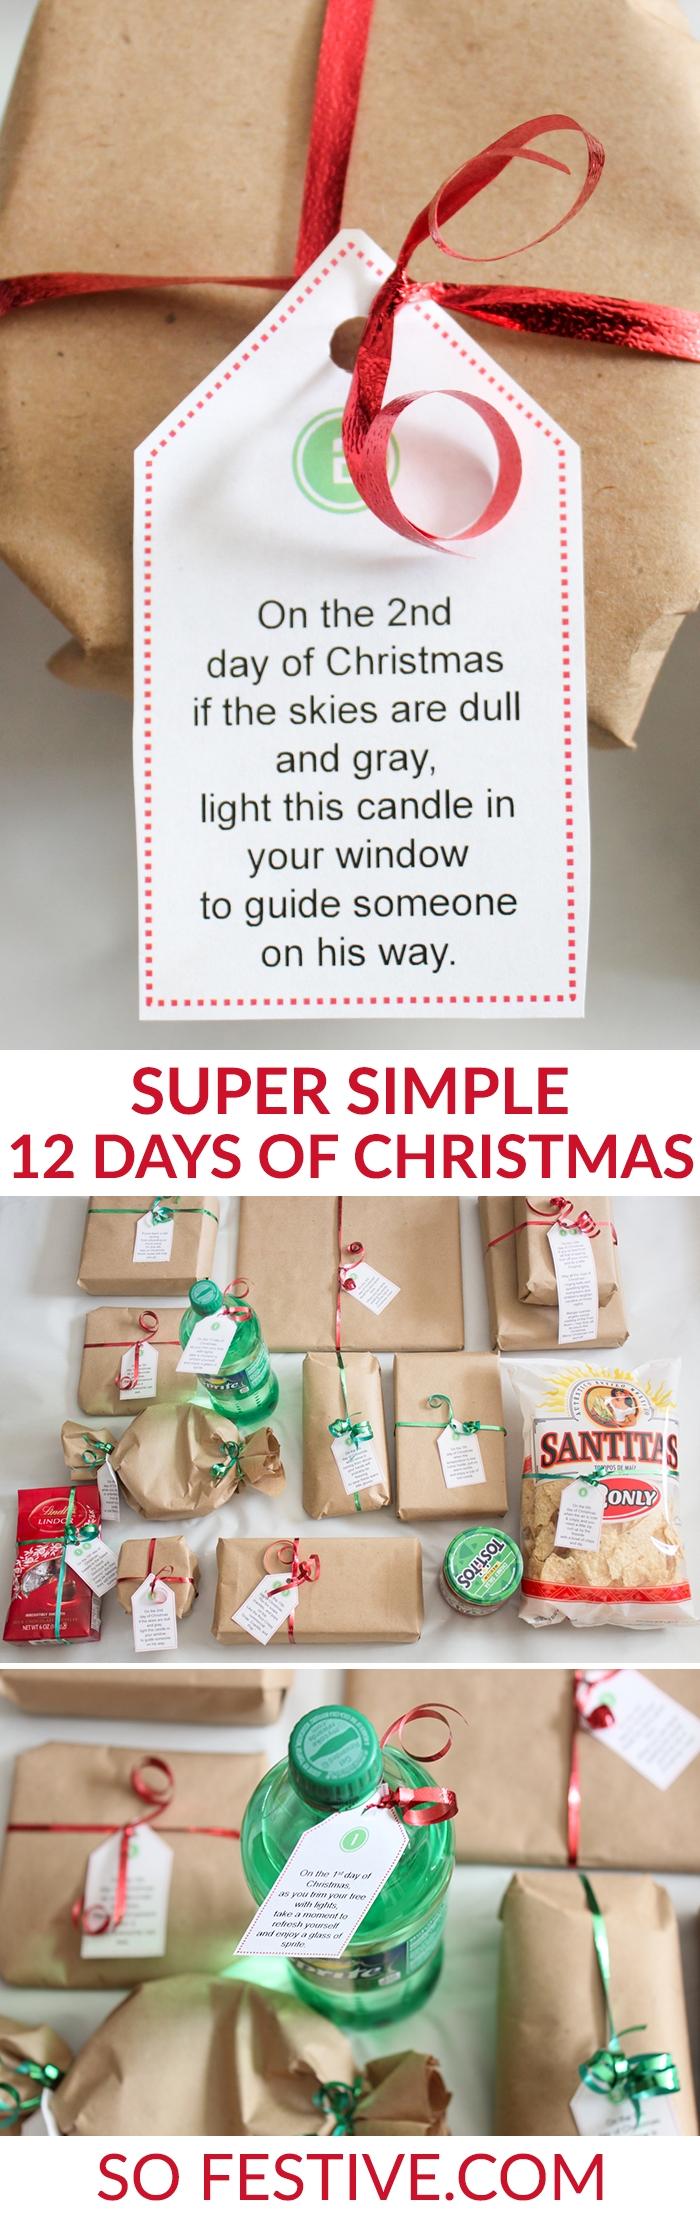 10 Stylish 12 Days Of Christmas Ideas For Boyfriend easy 12 days of christmas idea printables dollar stores poem 2